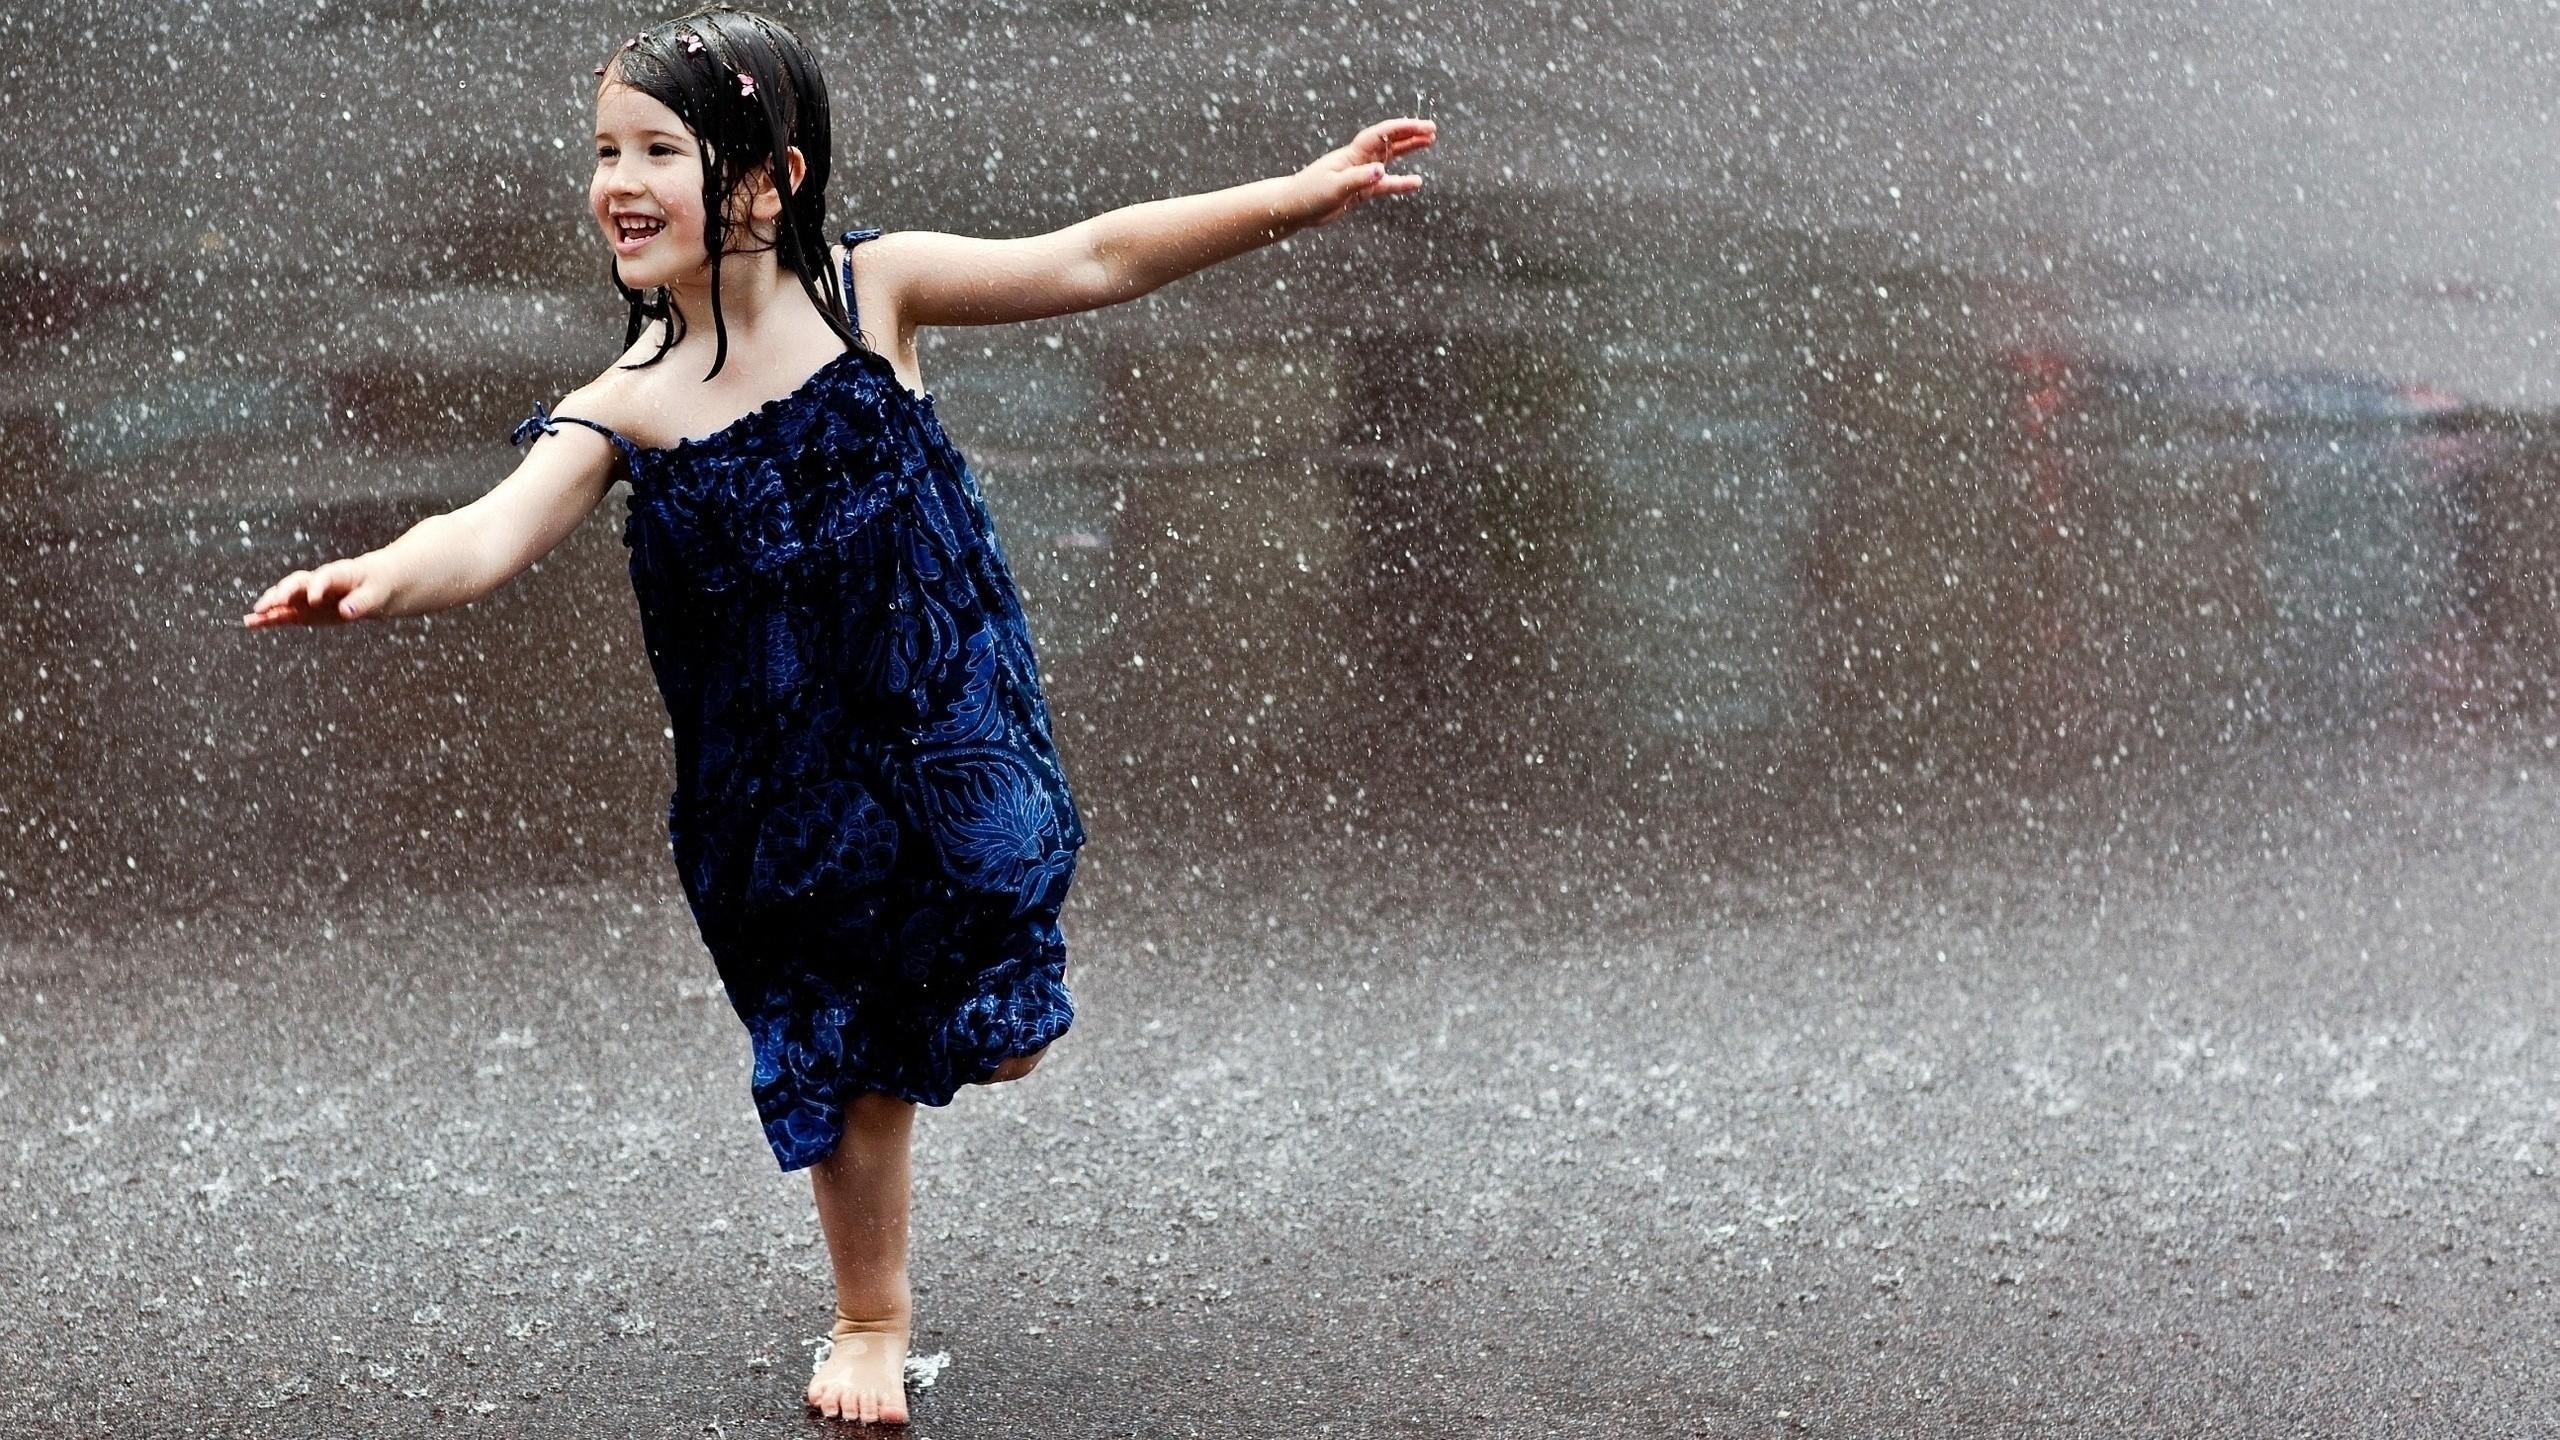 People___Children_Happy_child_runs_in_the_rain_071448_.jpg